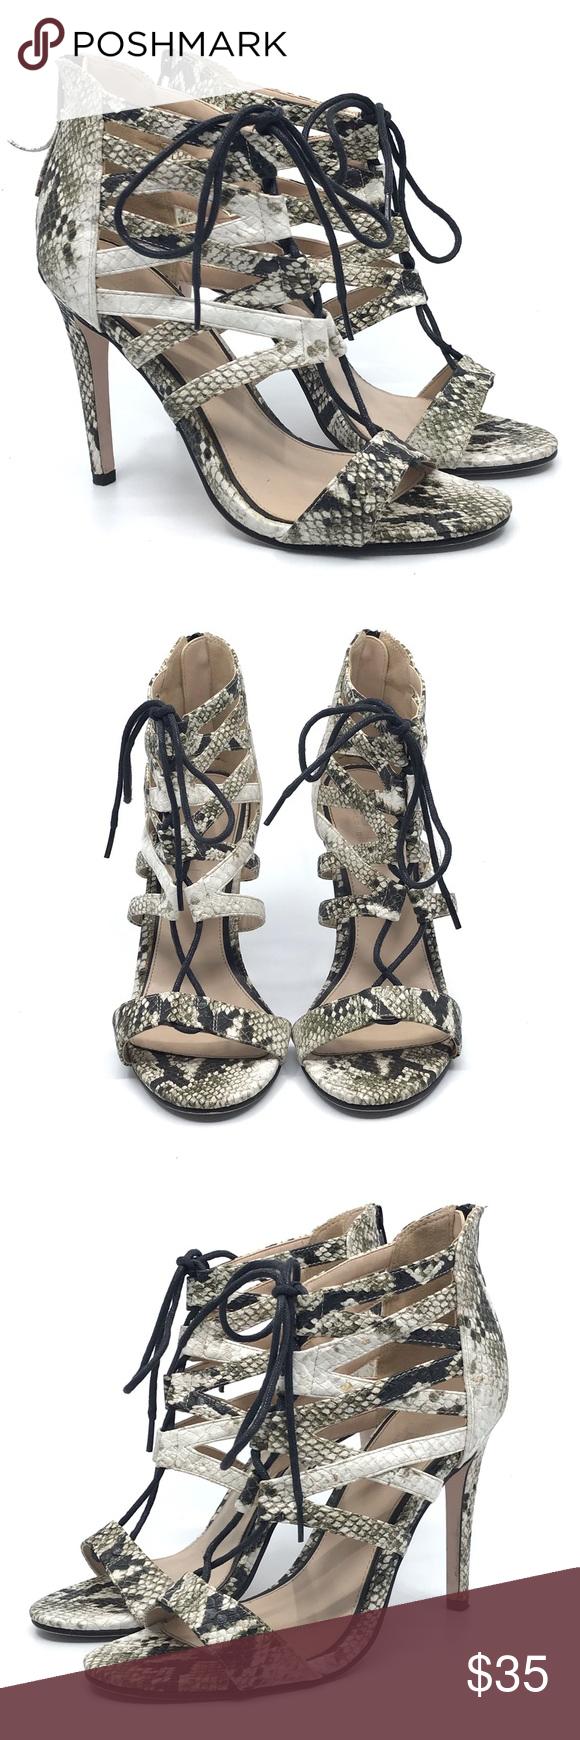 Office London Cream Black Snake Lace Up Cage Heel Caged Heels Heels Shoes Women Heels